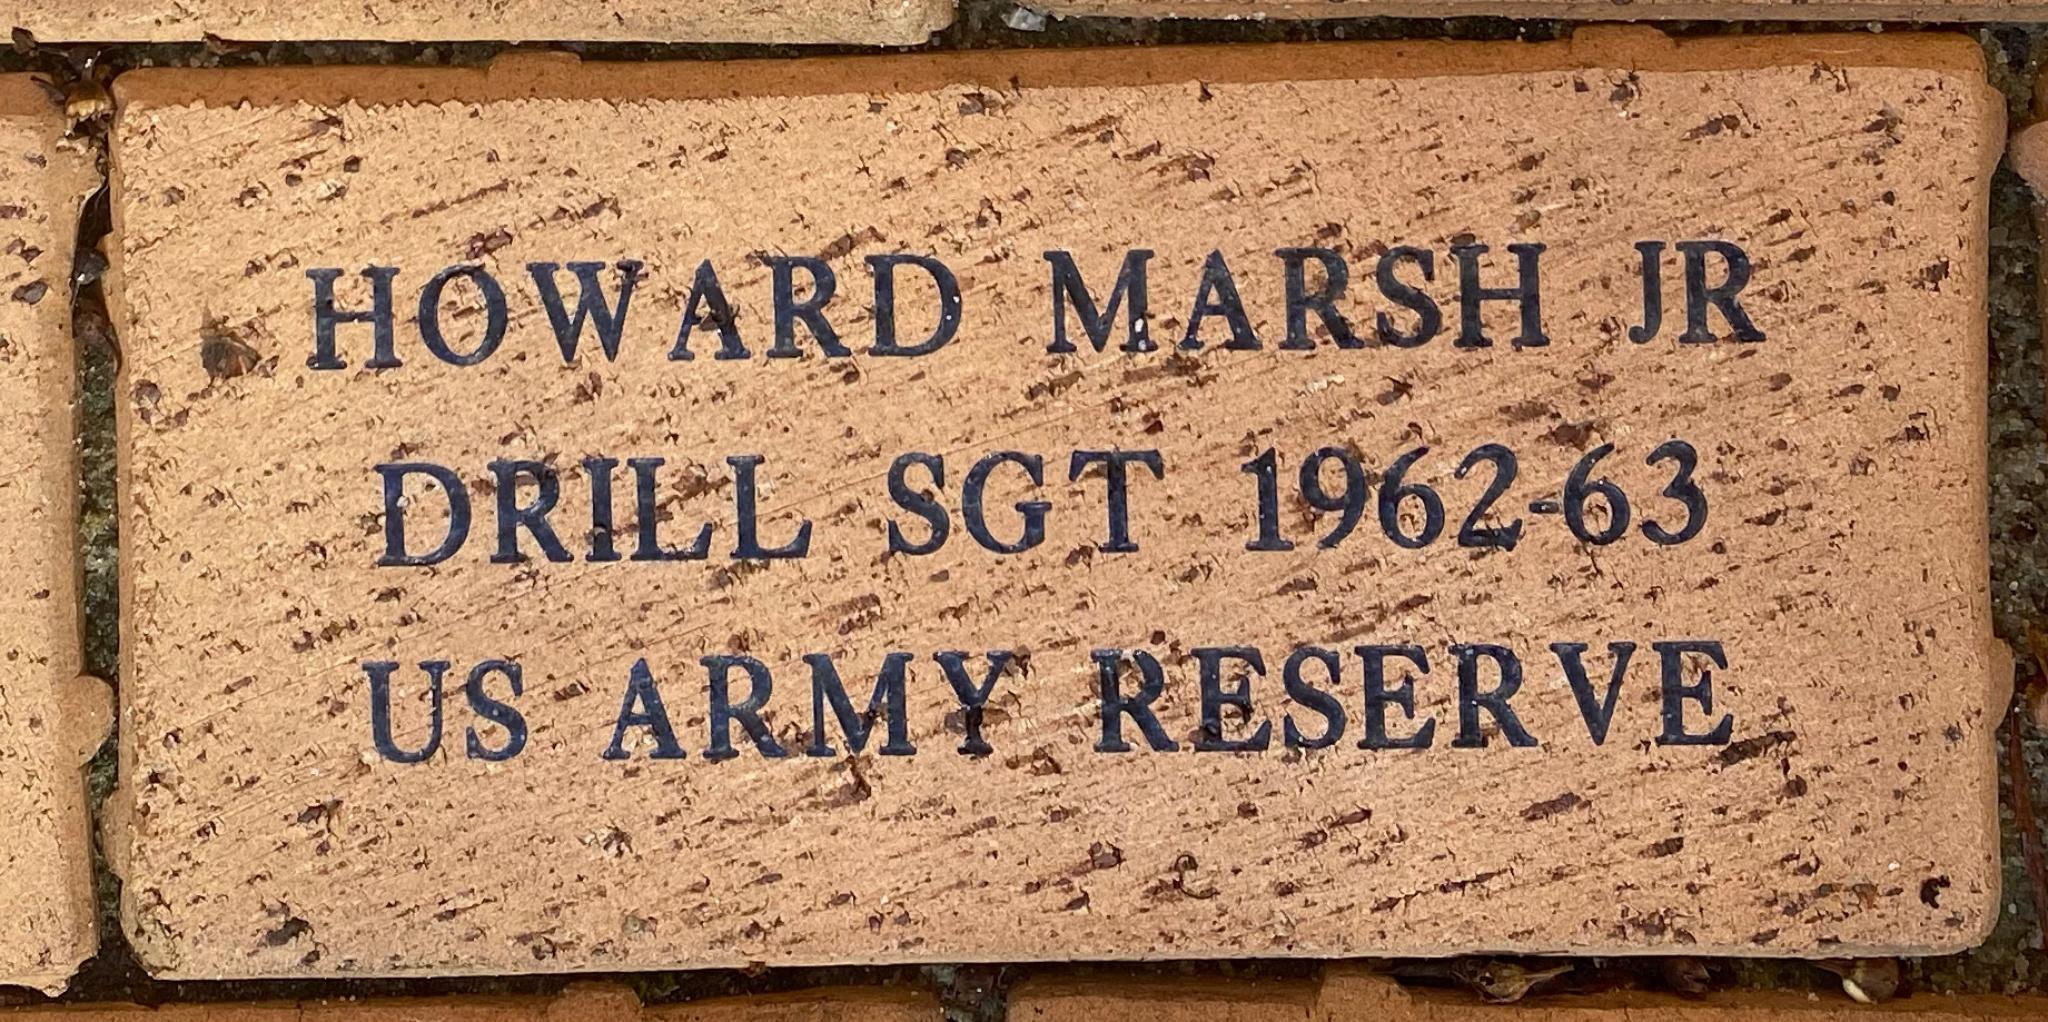 HOWARD MARSH JR DRILL SGT 1962-63 US ARMY RESERVE